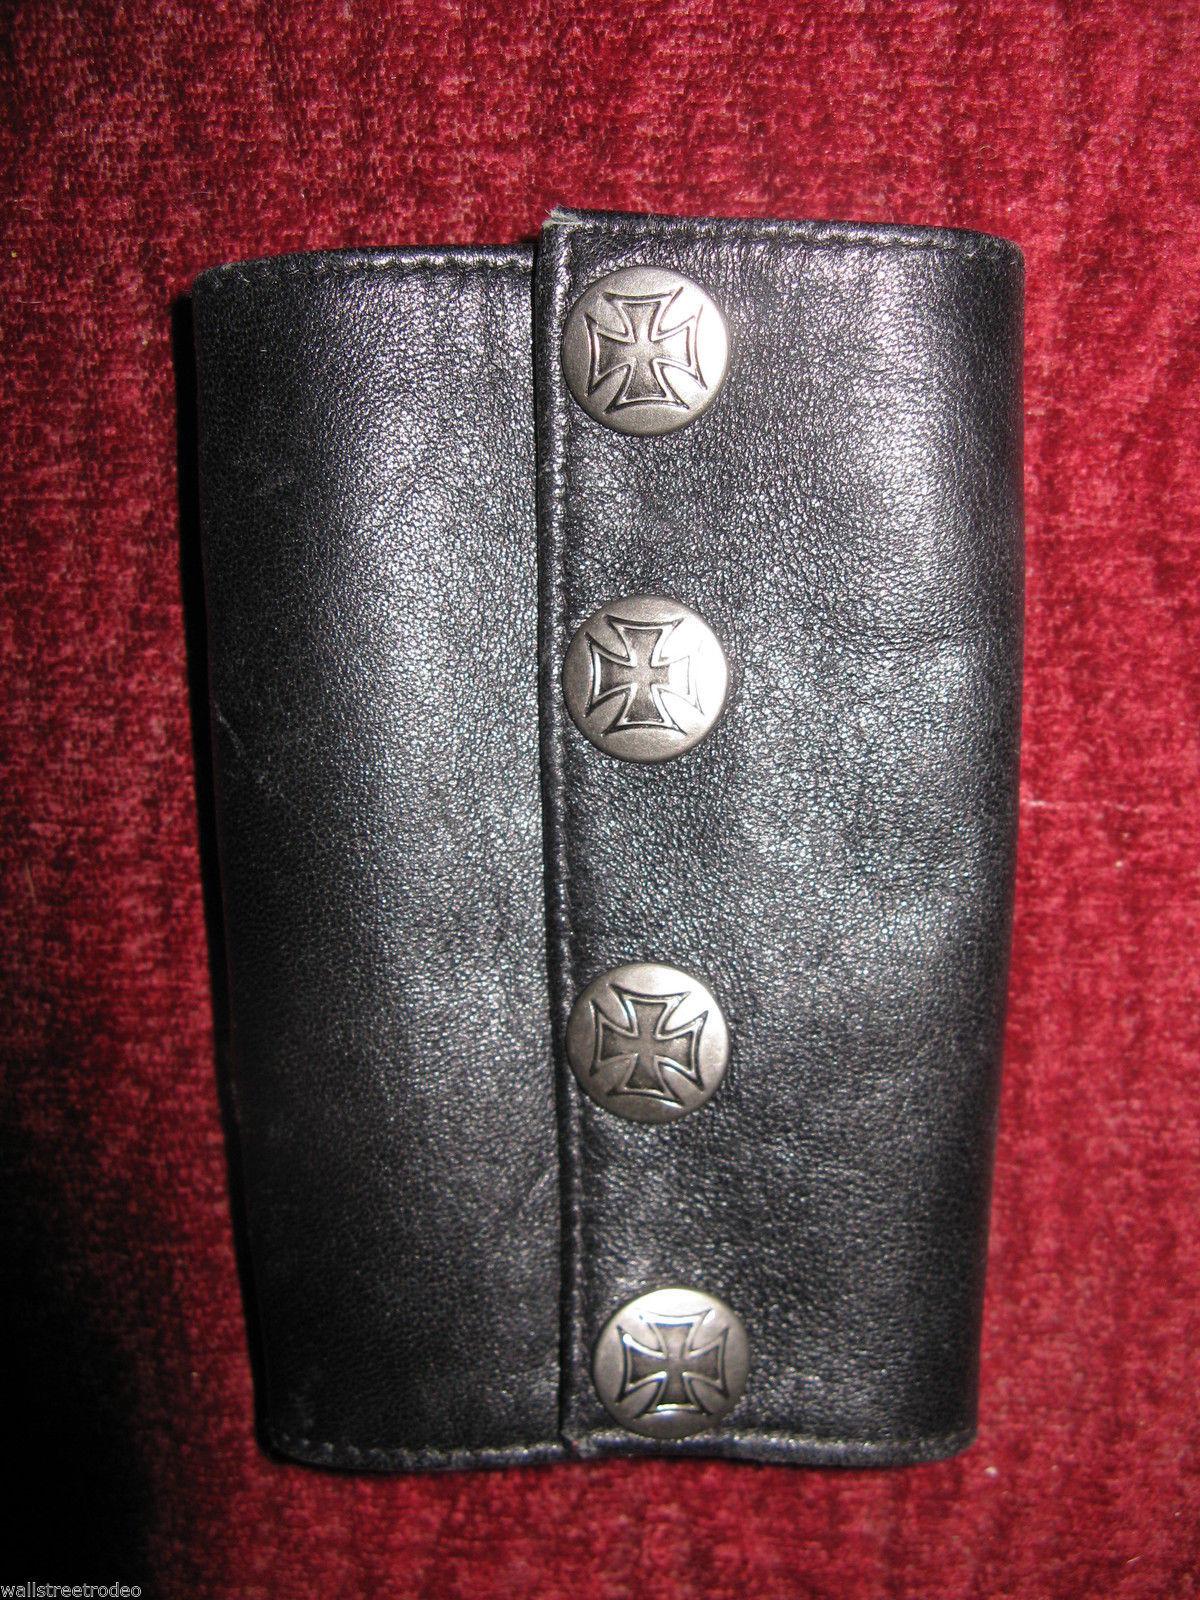 Smakworks Lip Service Iron Maltese Cross leather wristband cuff bracelet XS image 3